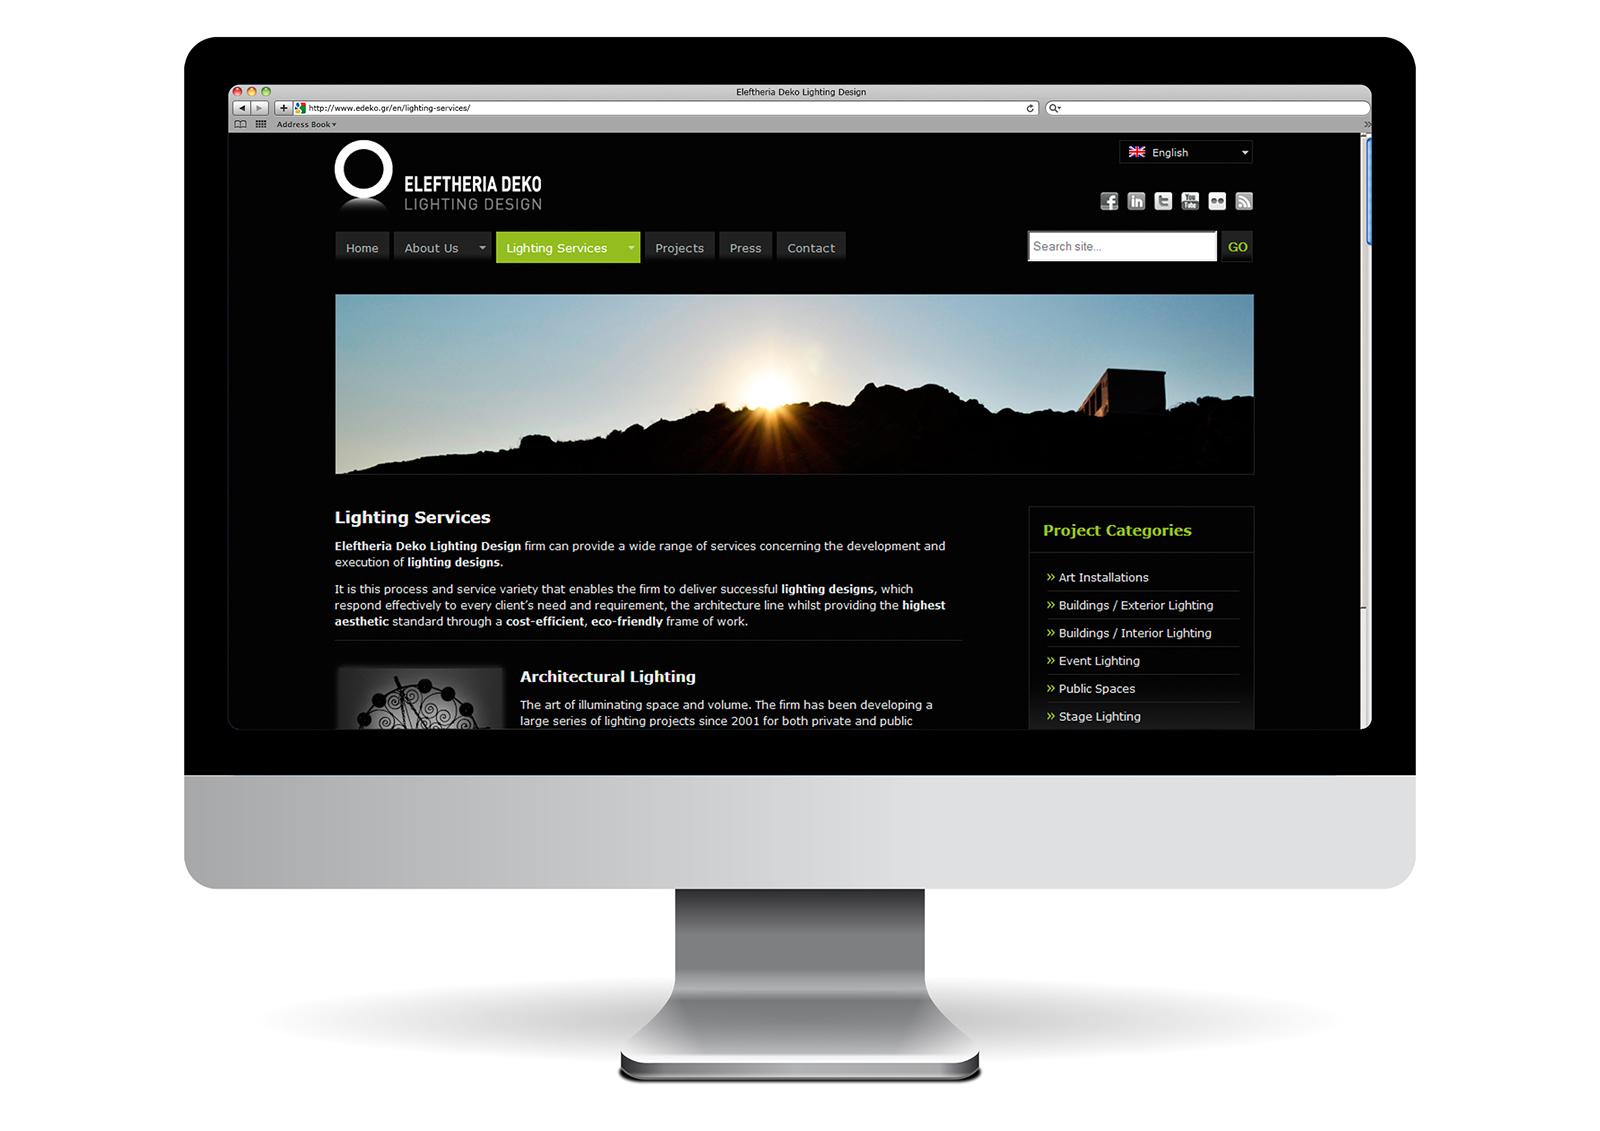 Eleftheria Deko_Lighting services page_Yianart